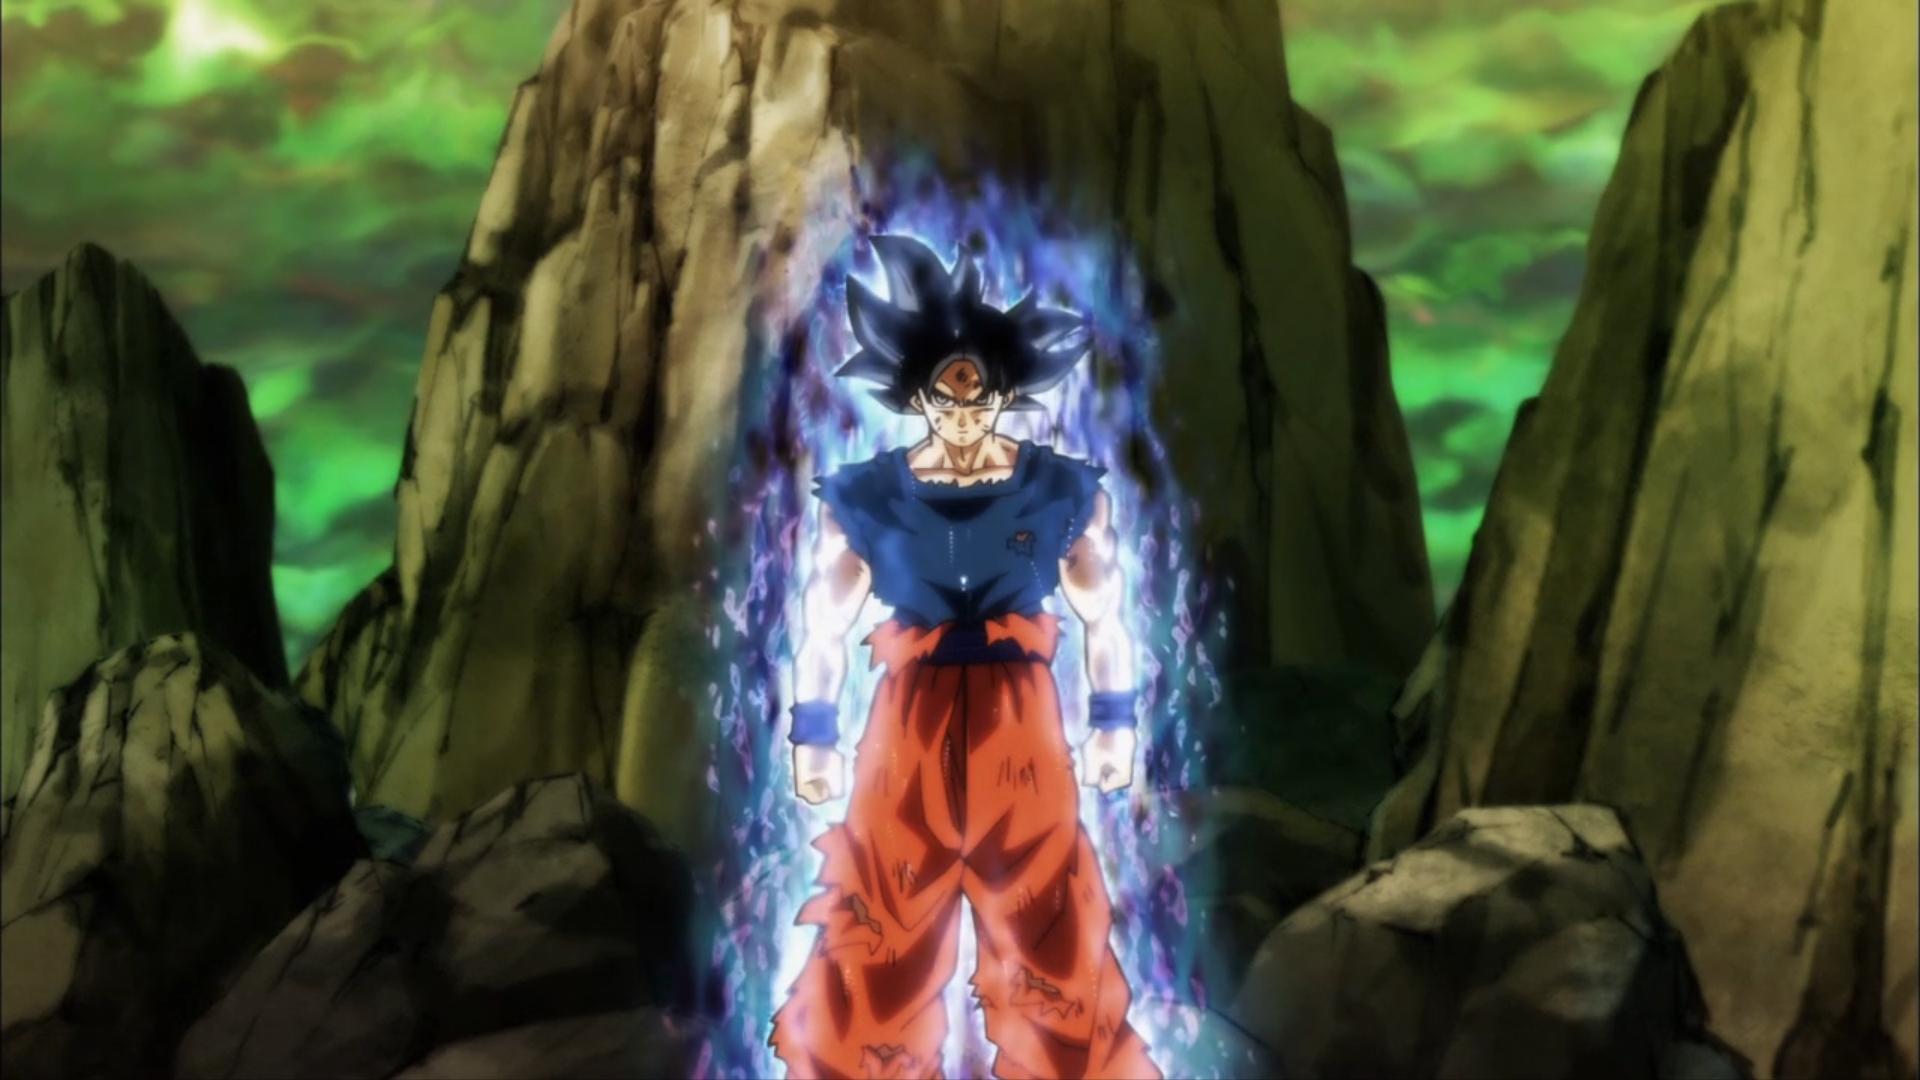 Goku Ultra Instinct Full HD Wallpaper and Background Image 1920x1080